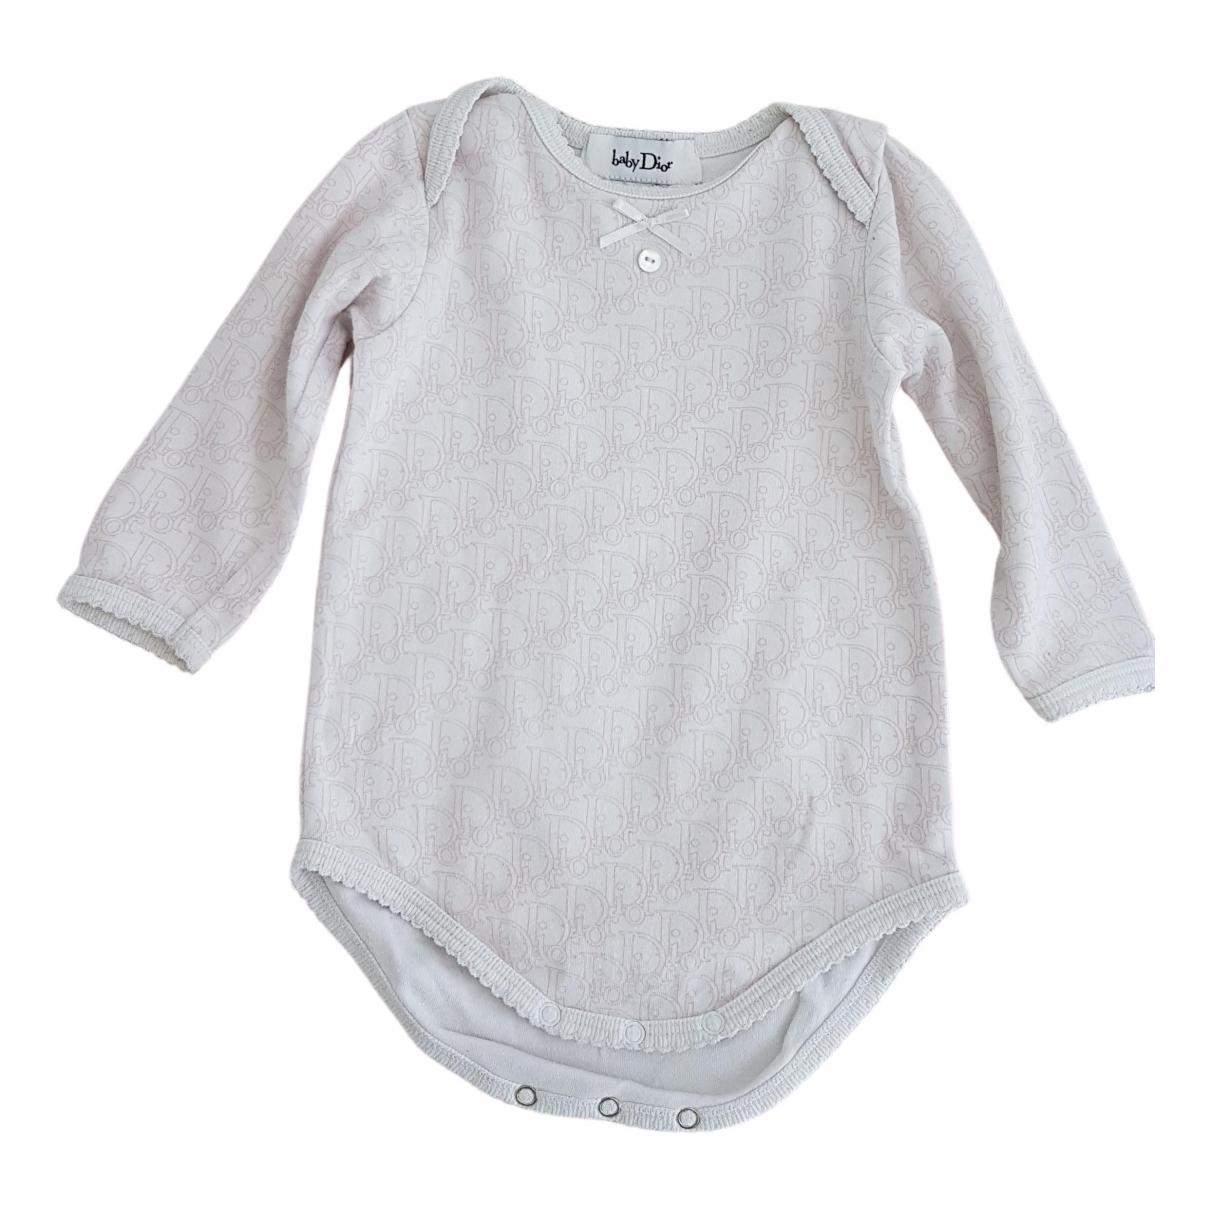 Camiseta Baby Dior